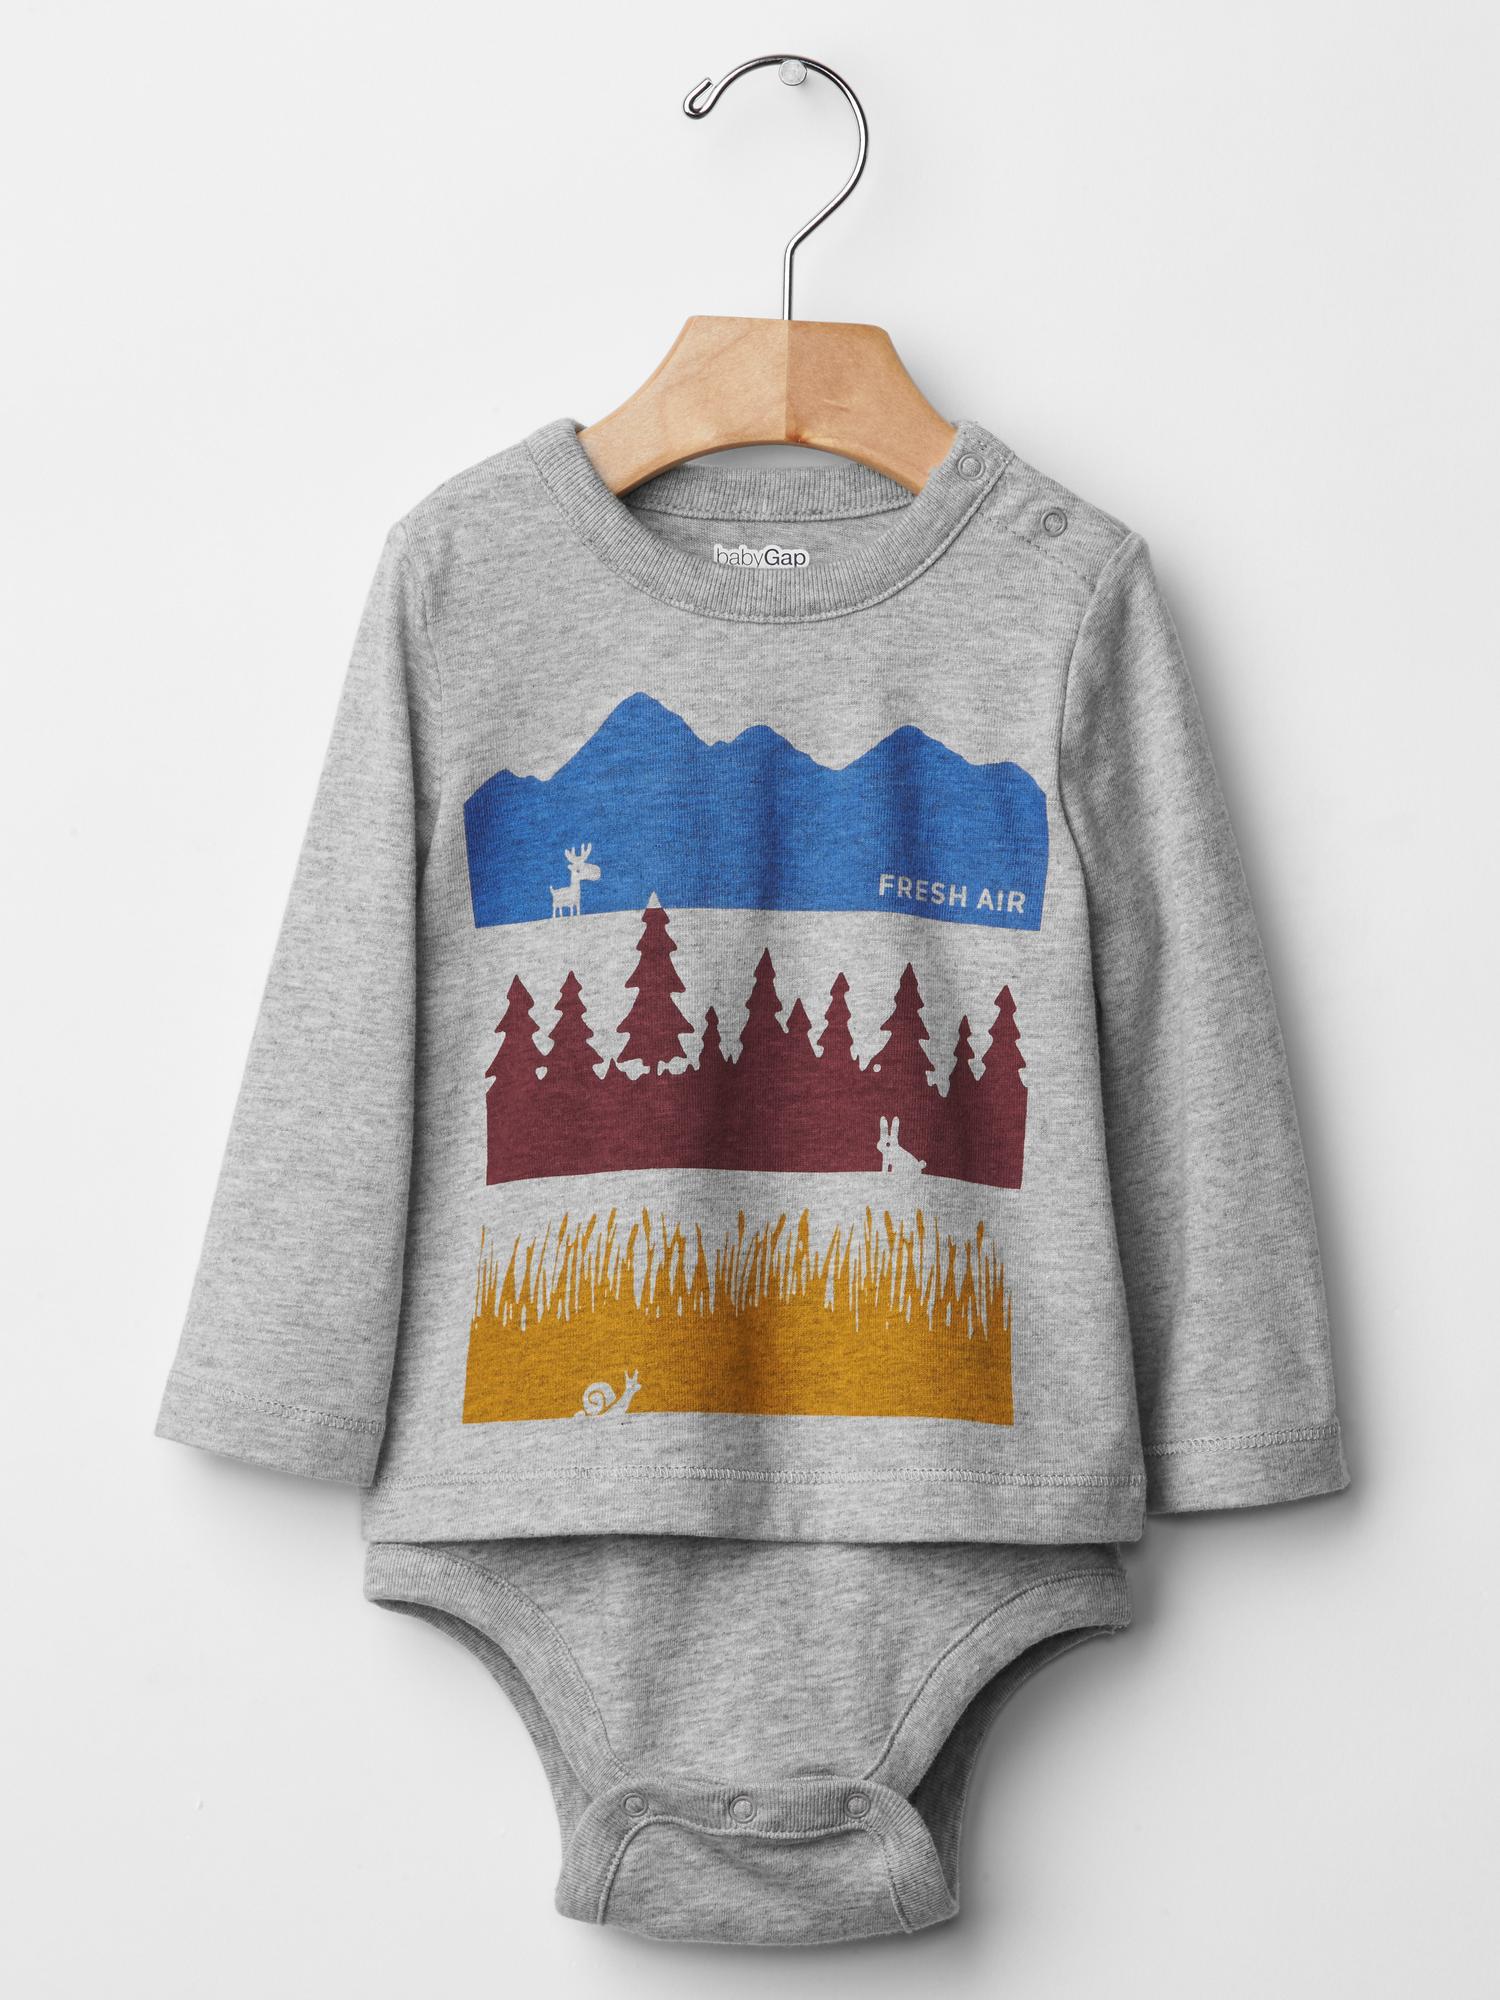 Fresh Air Graphic Bodysuit from Baby Gap